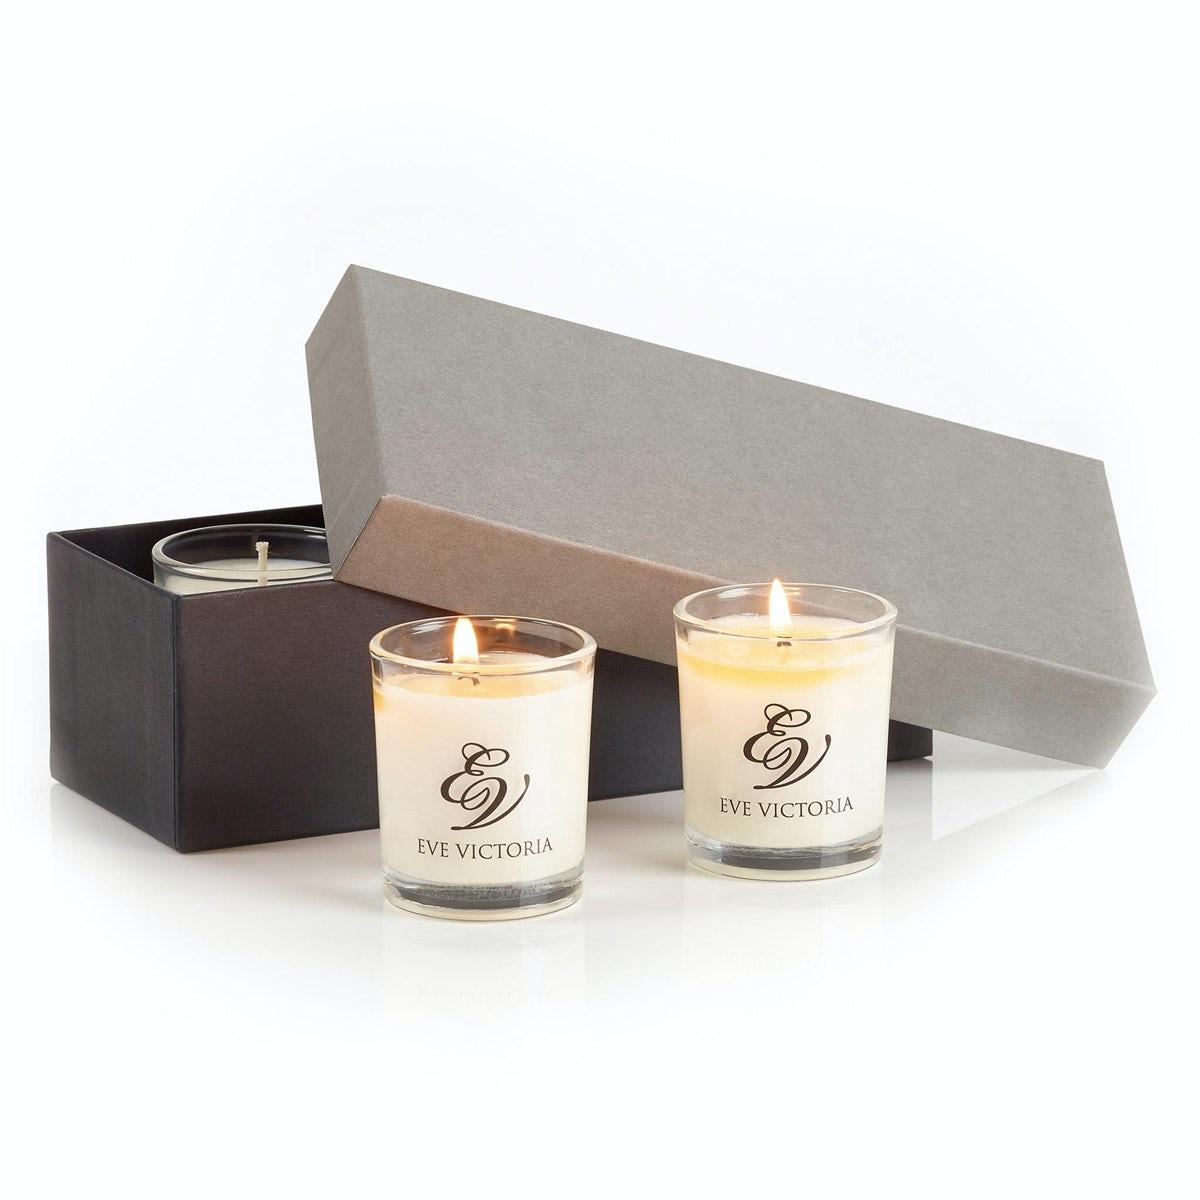 Eve Victoria Neroli, rose & sandalwood 3 Votive gift box 9cl